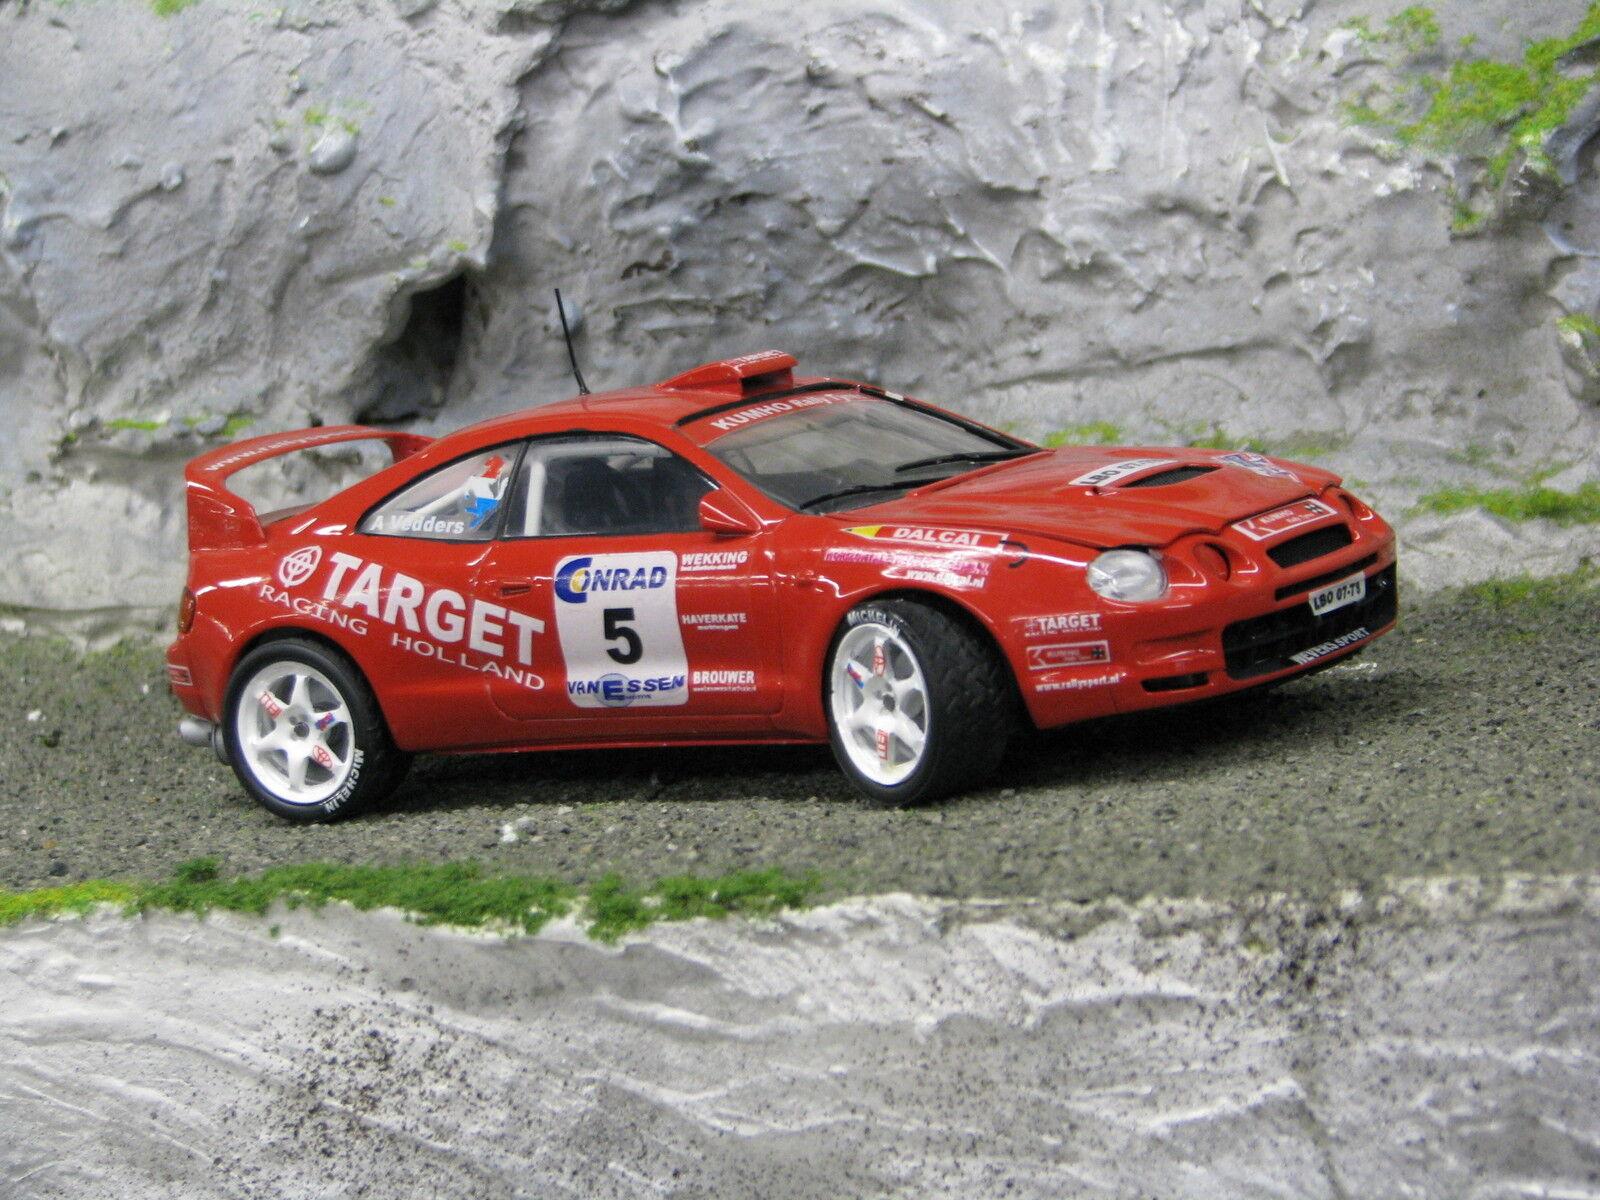 QSP Toyota Celica GT-Four 1 24  5 Nijhof   Vedders Marchall Conrad Euregio Rally